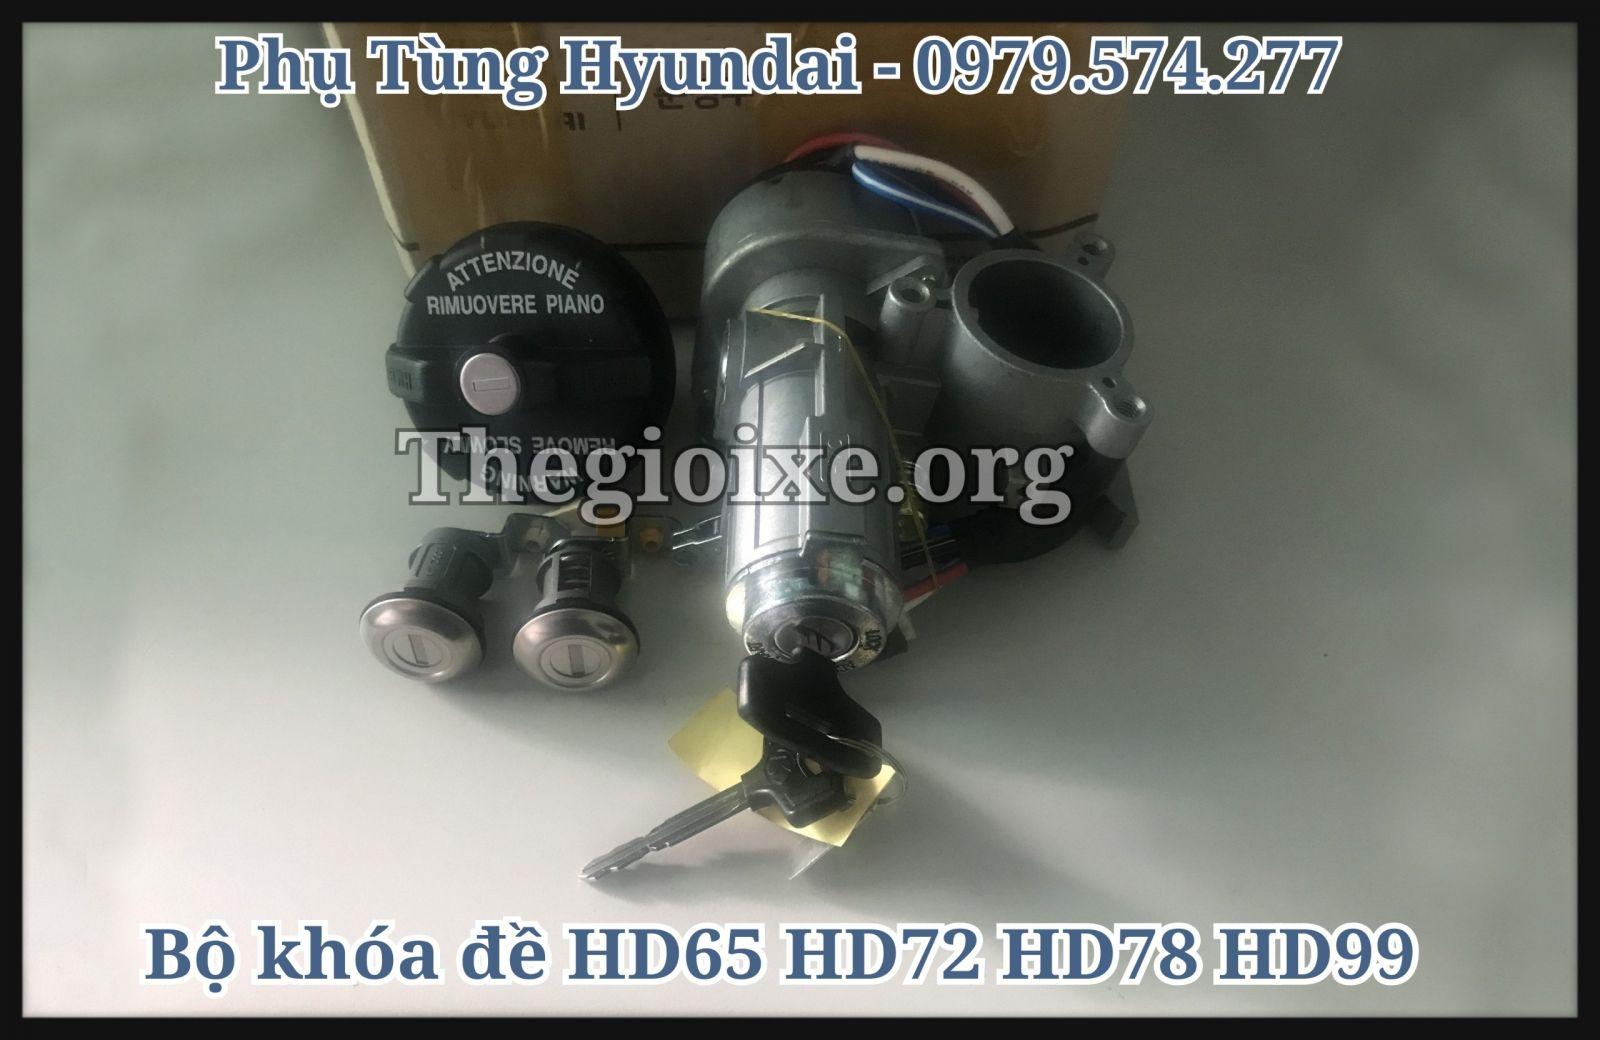 O KHOA DE XE TAI HD99